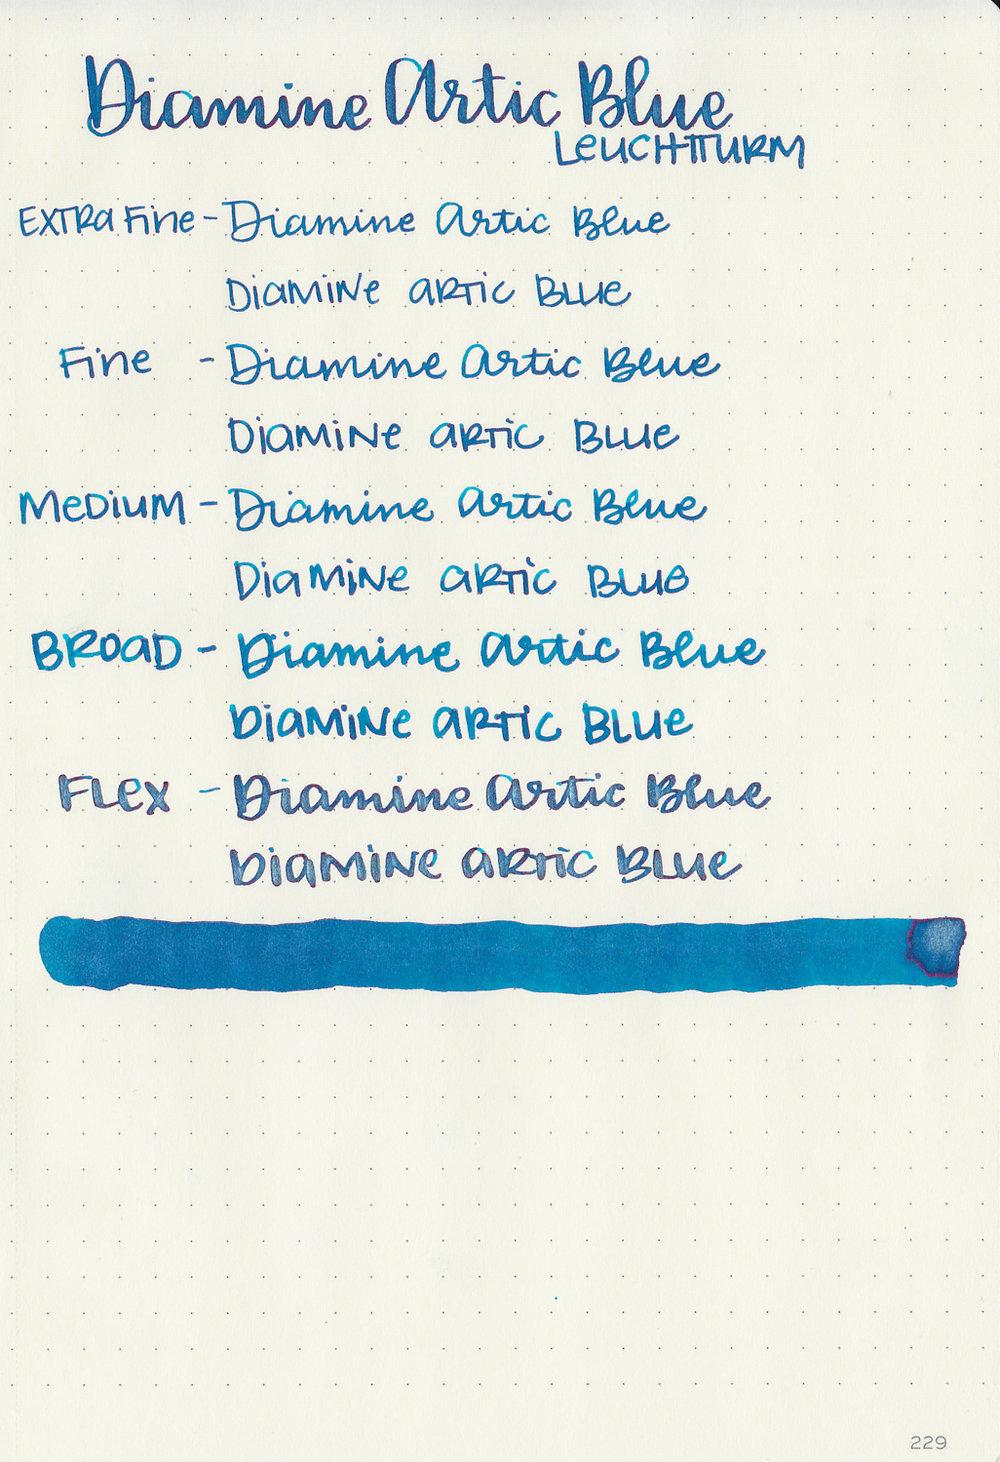 DArticBlue-9.jpg